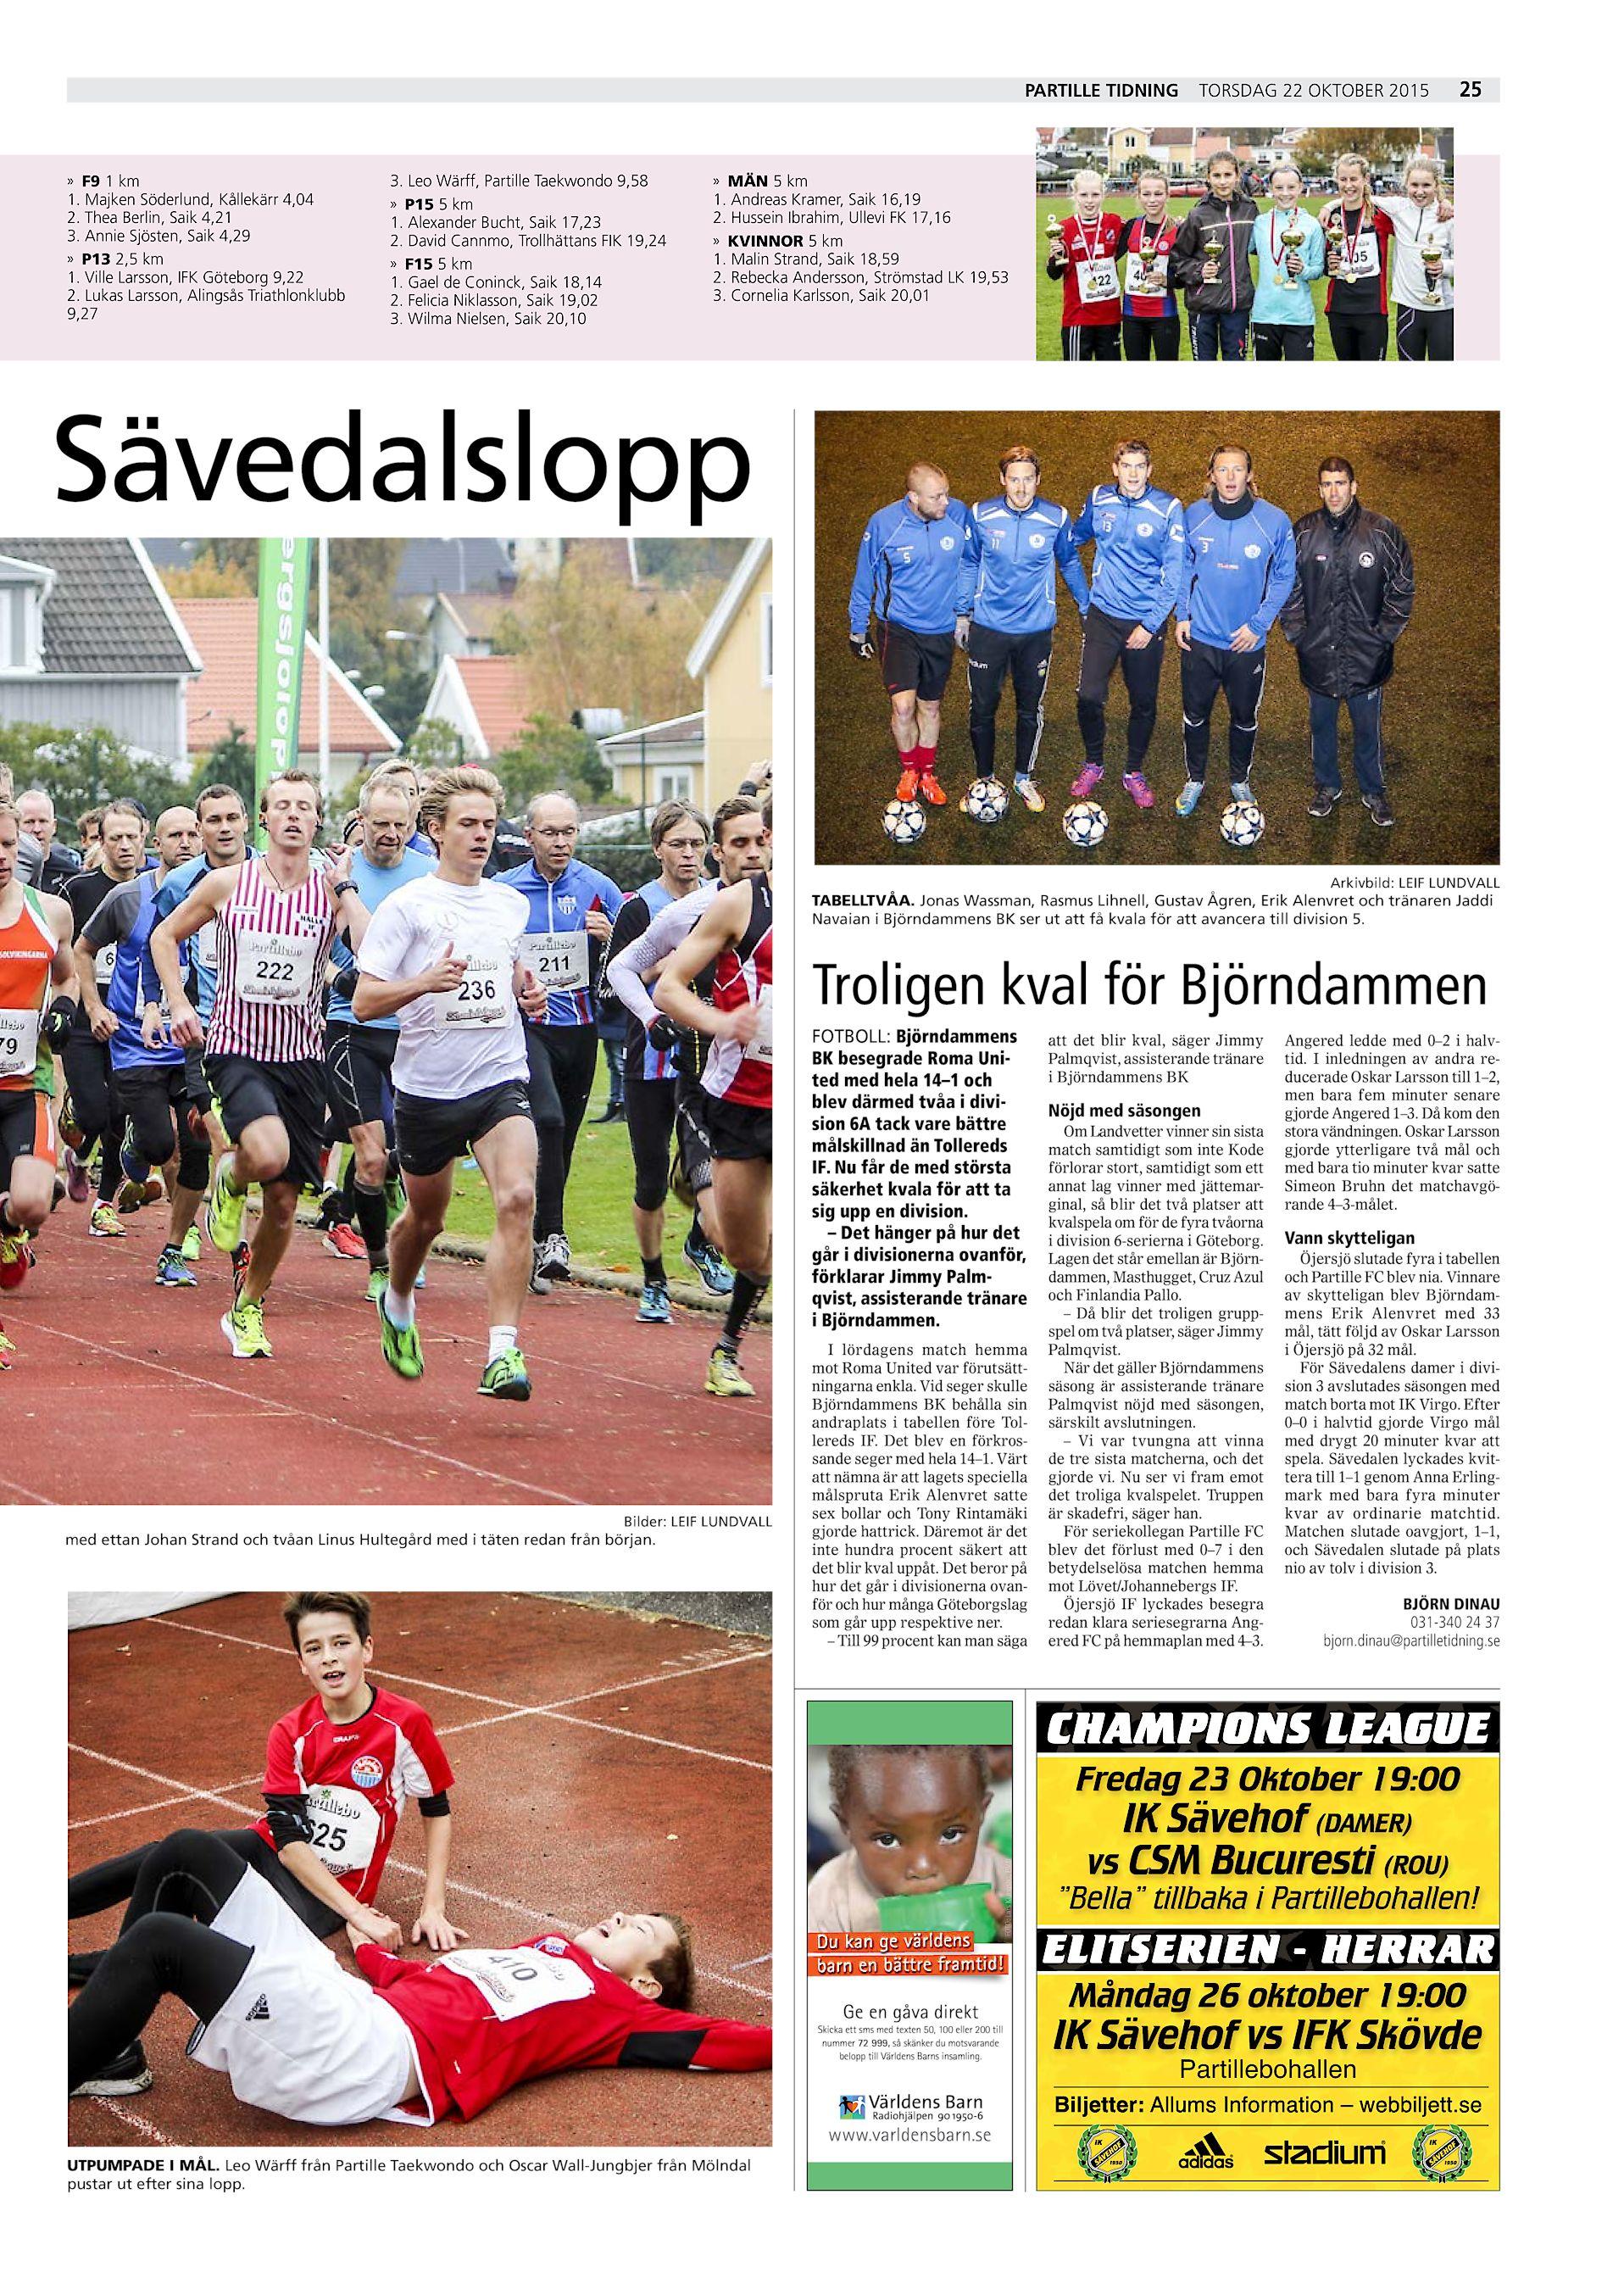 newest 003ac 4b759 Härrydaposten   Partille Tidning PT-2015-10-22 (endast text)